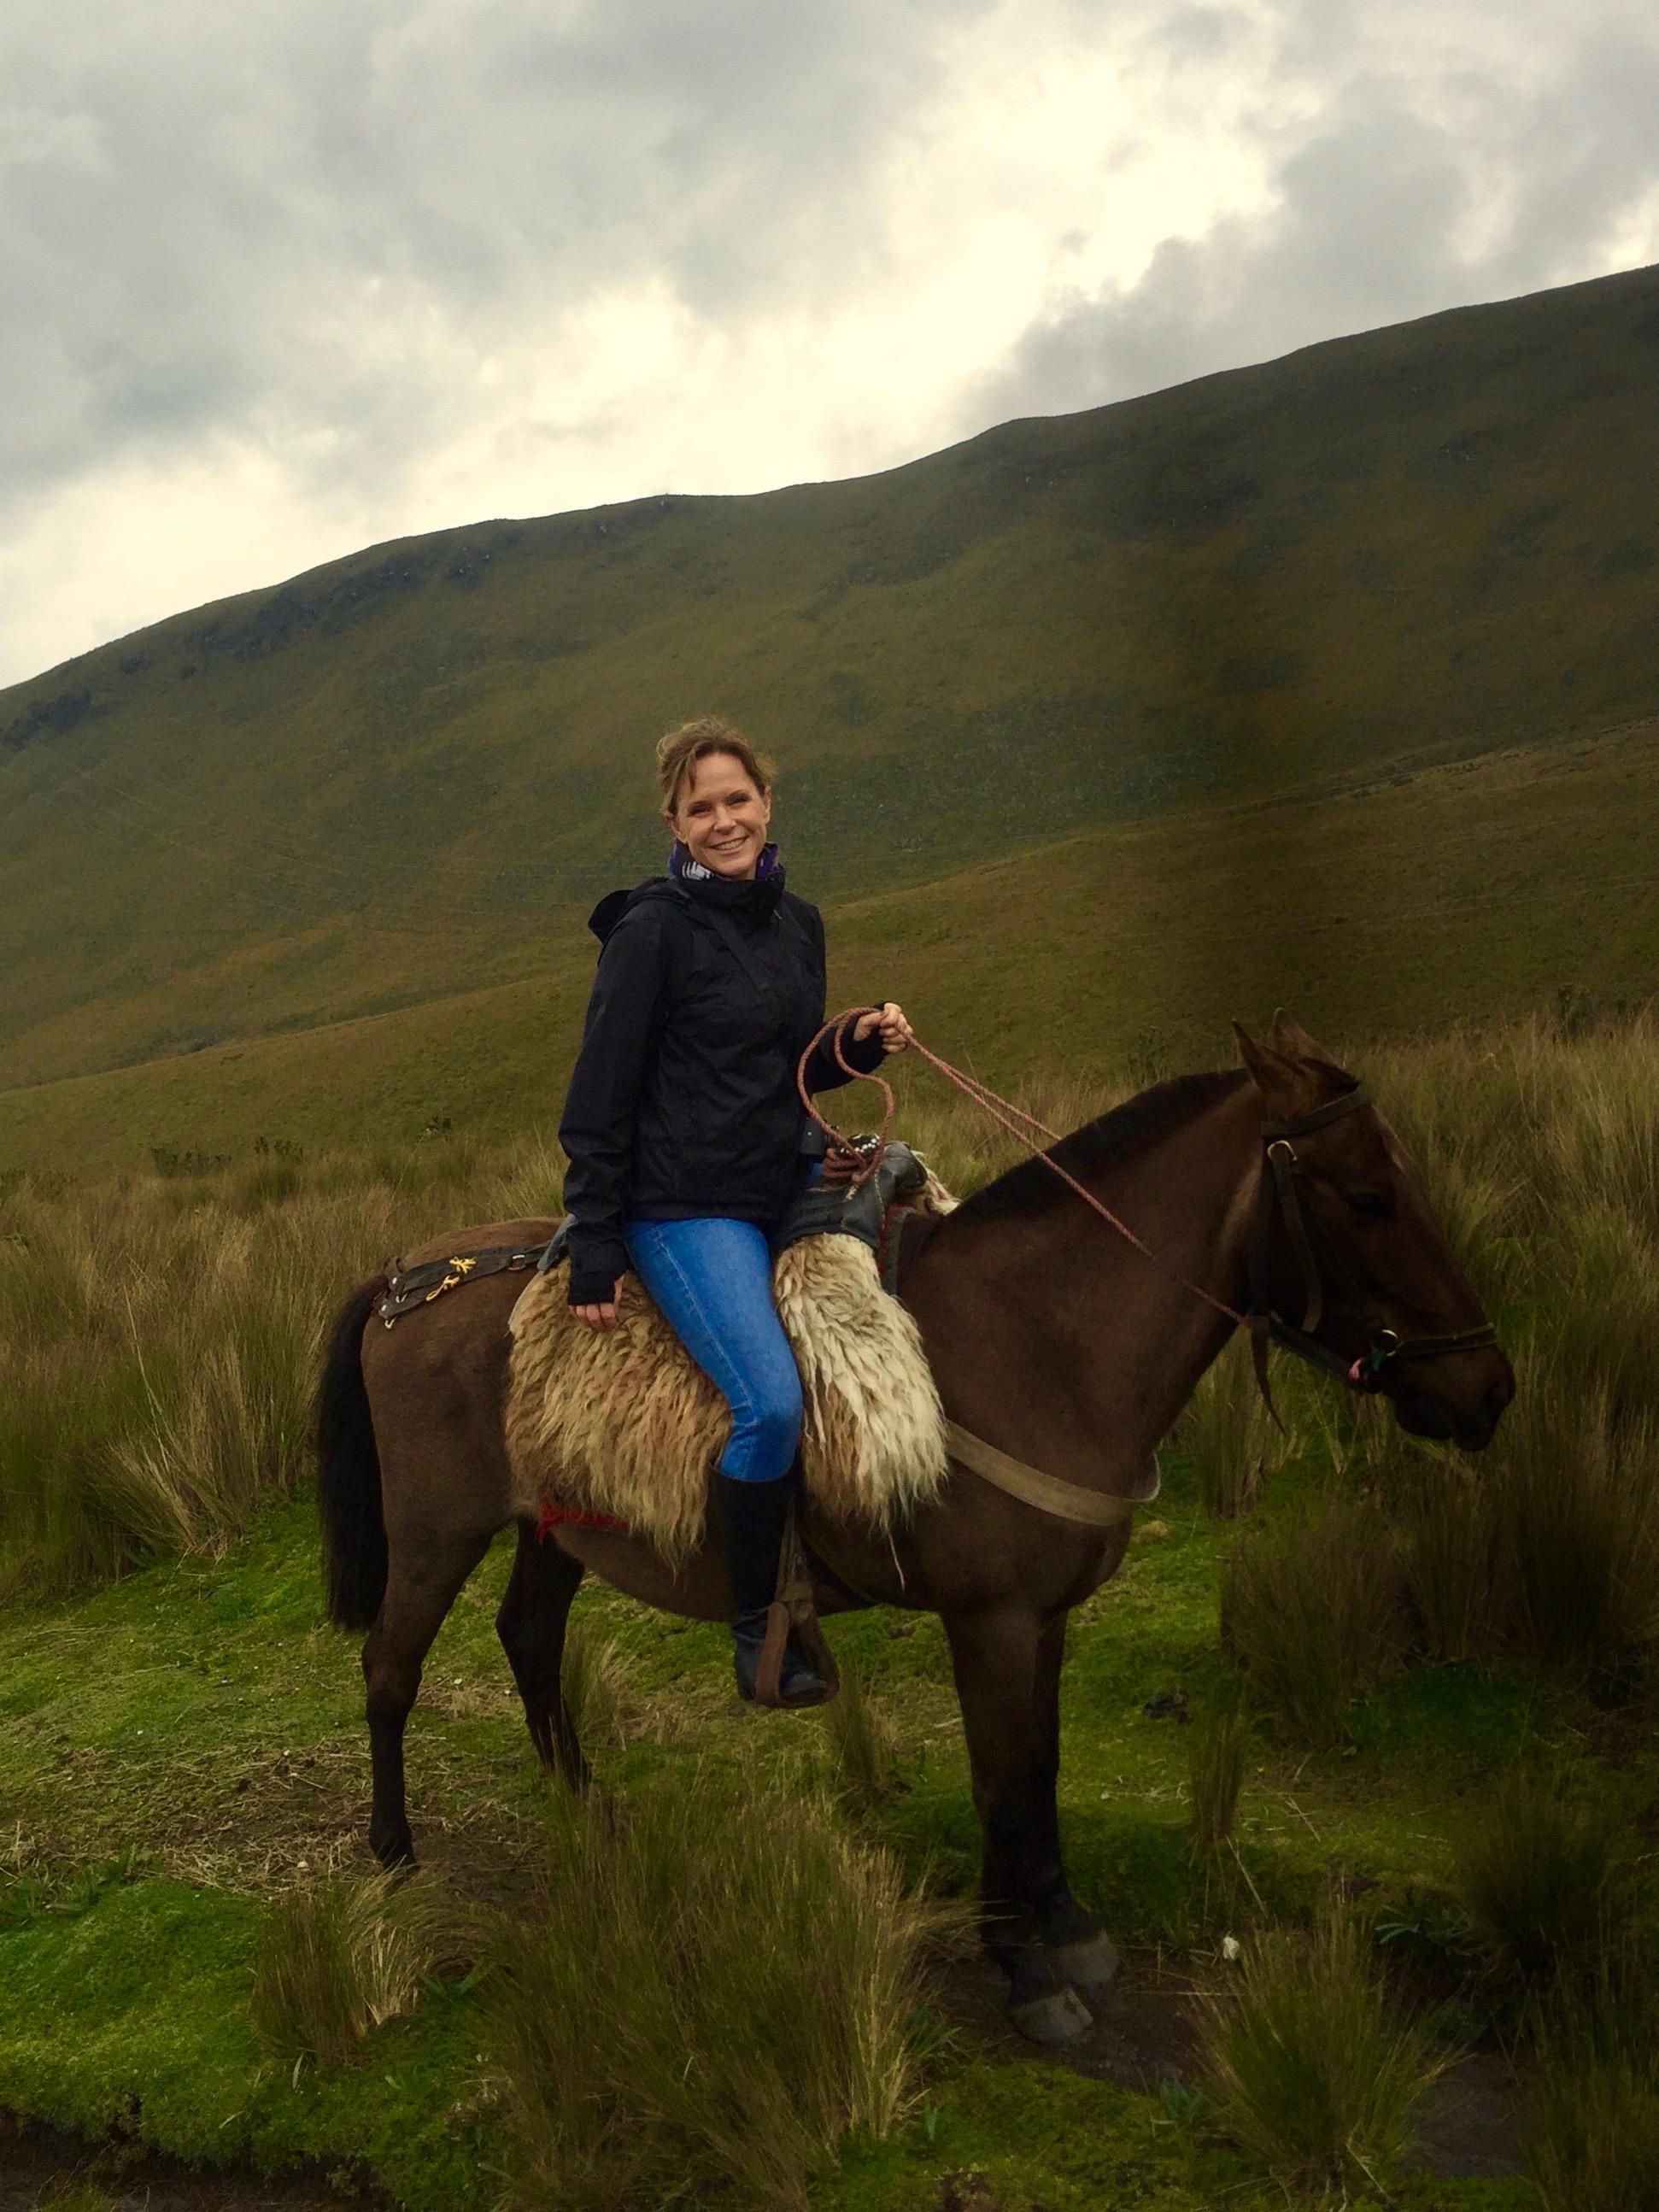 Enjoying a horse back ride